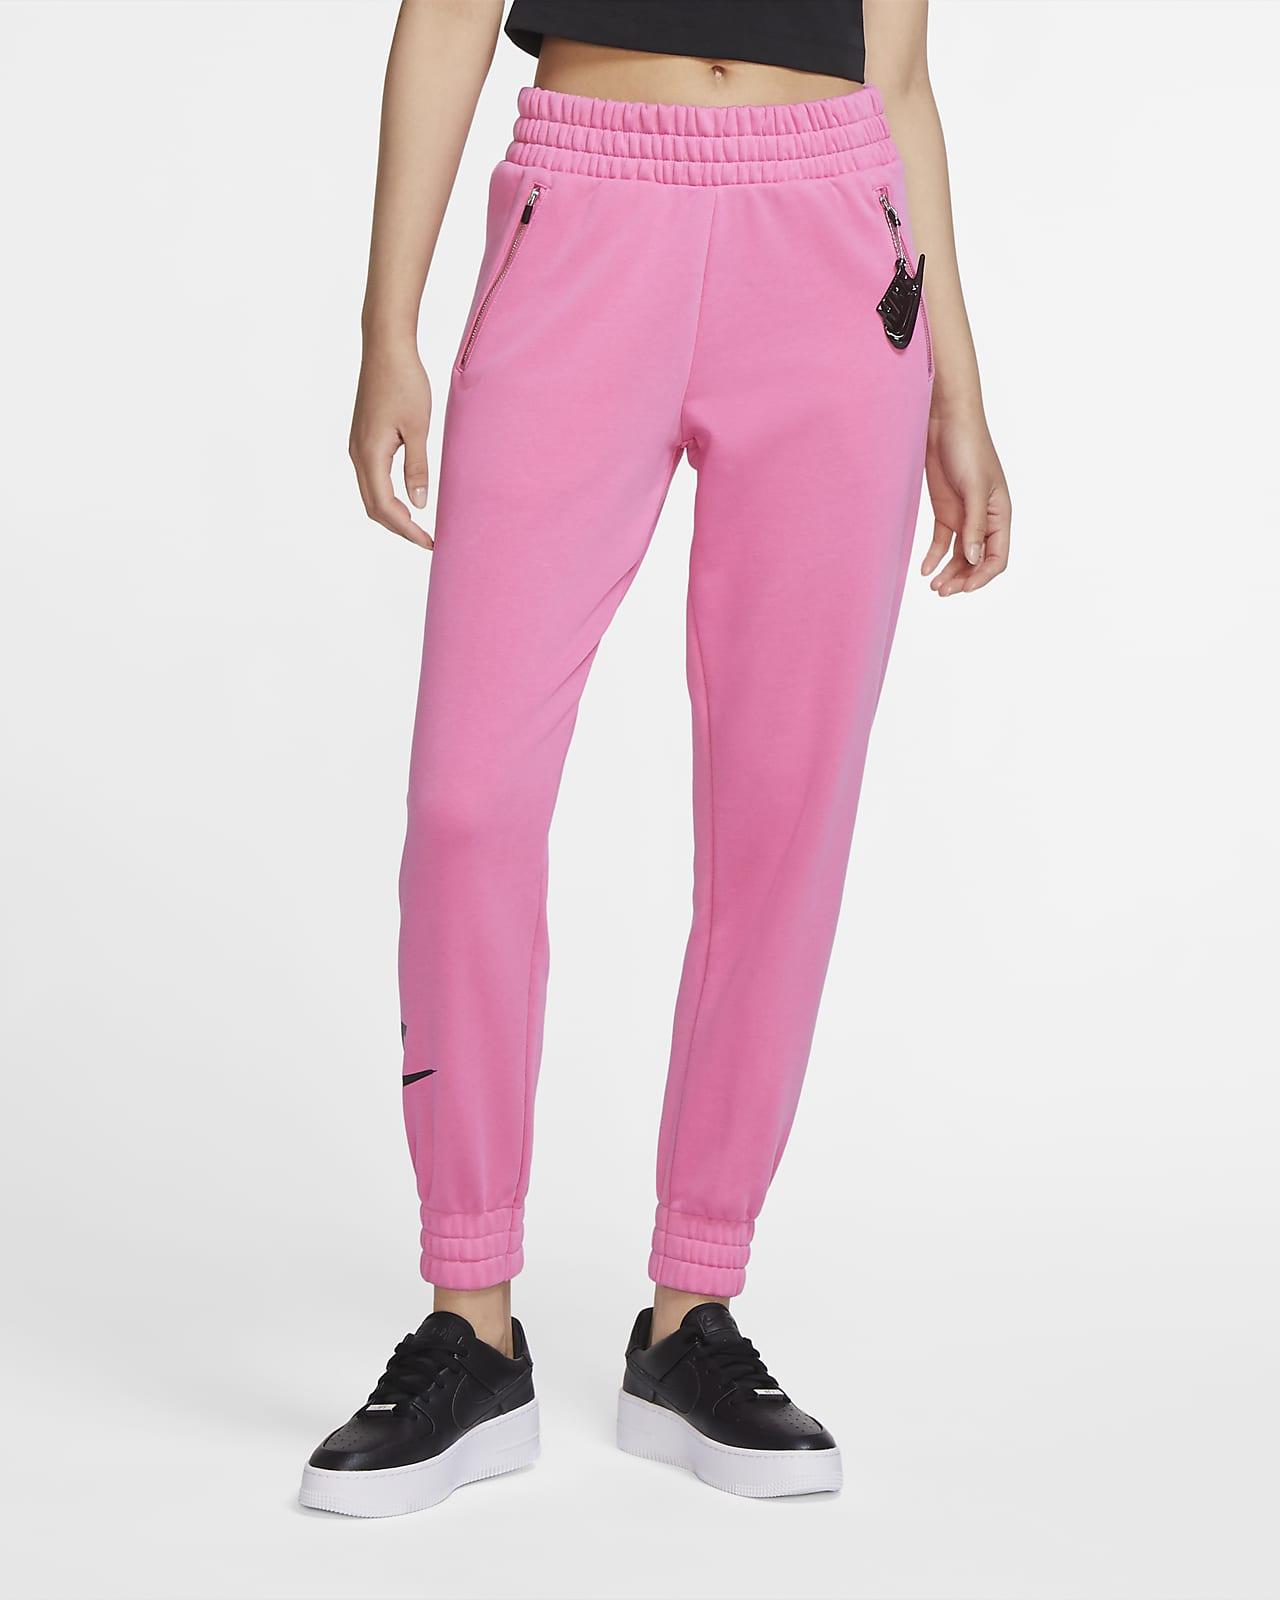 Pantalones de tejido Fleece 7/8 para mujer Nike Sportswear